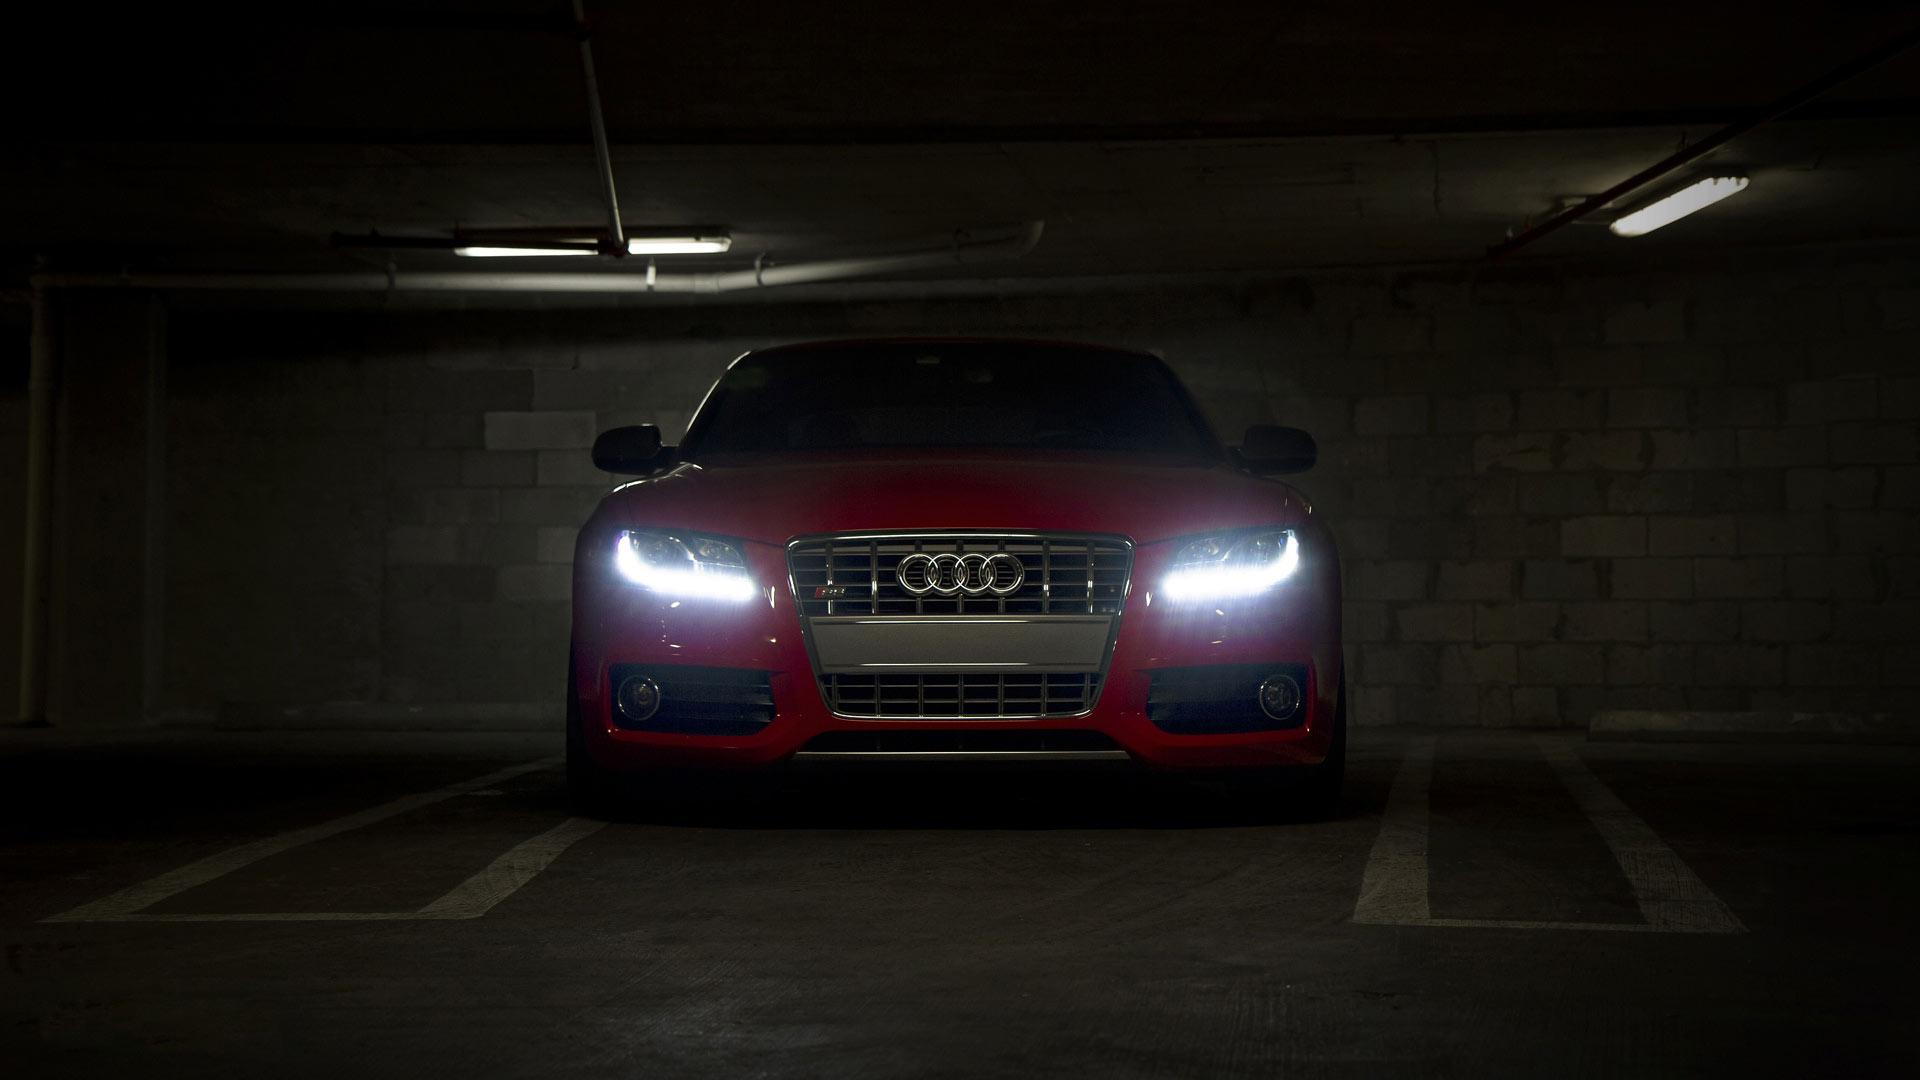 Audi S5 Красная